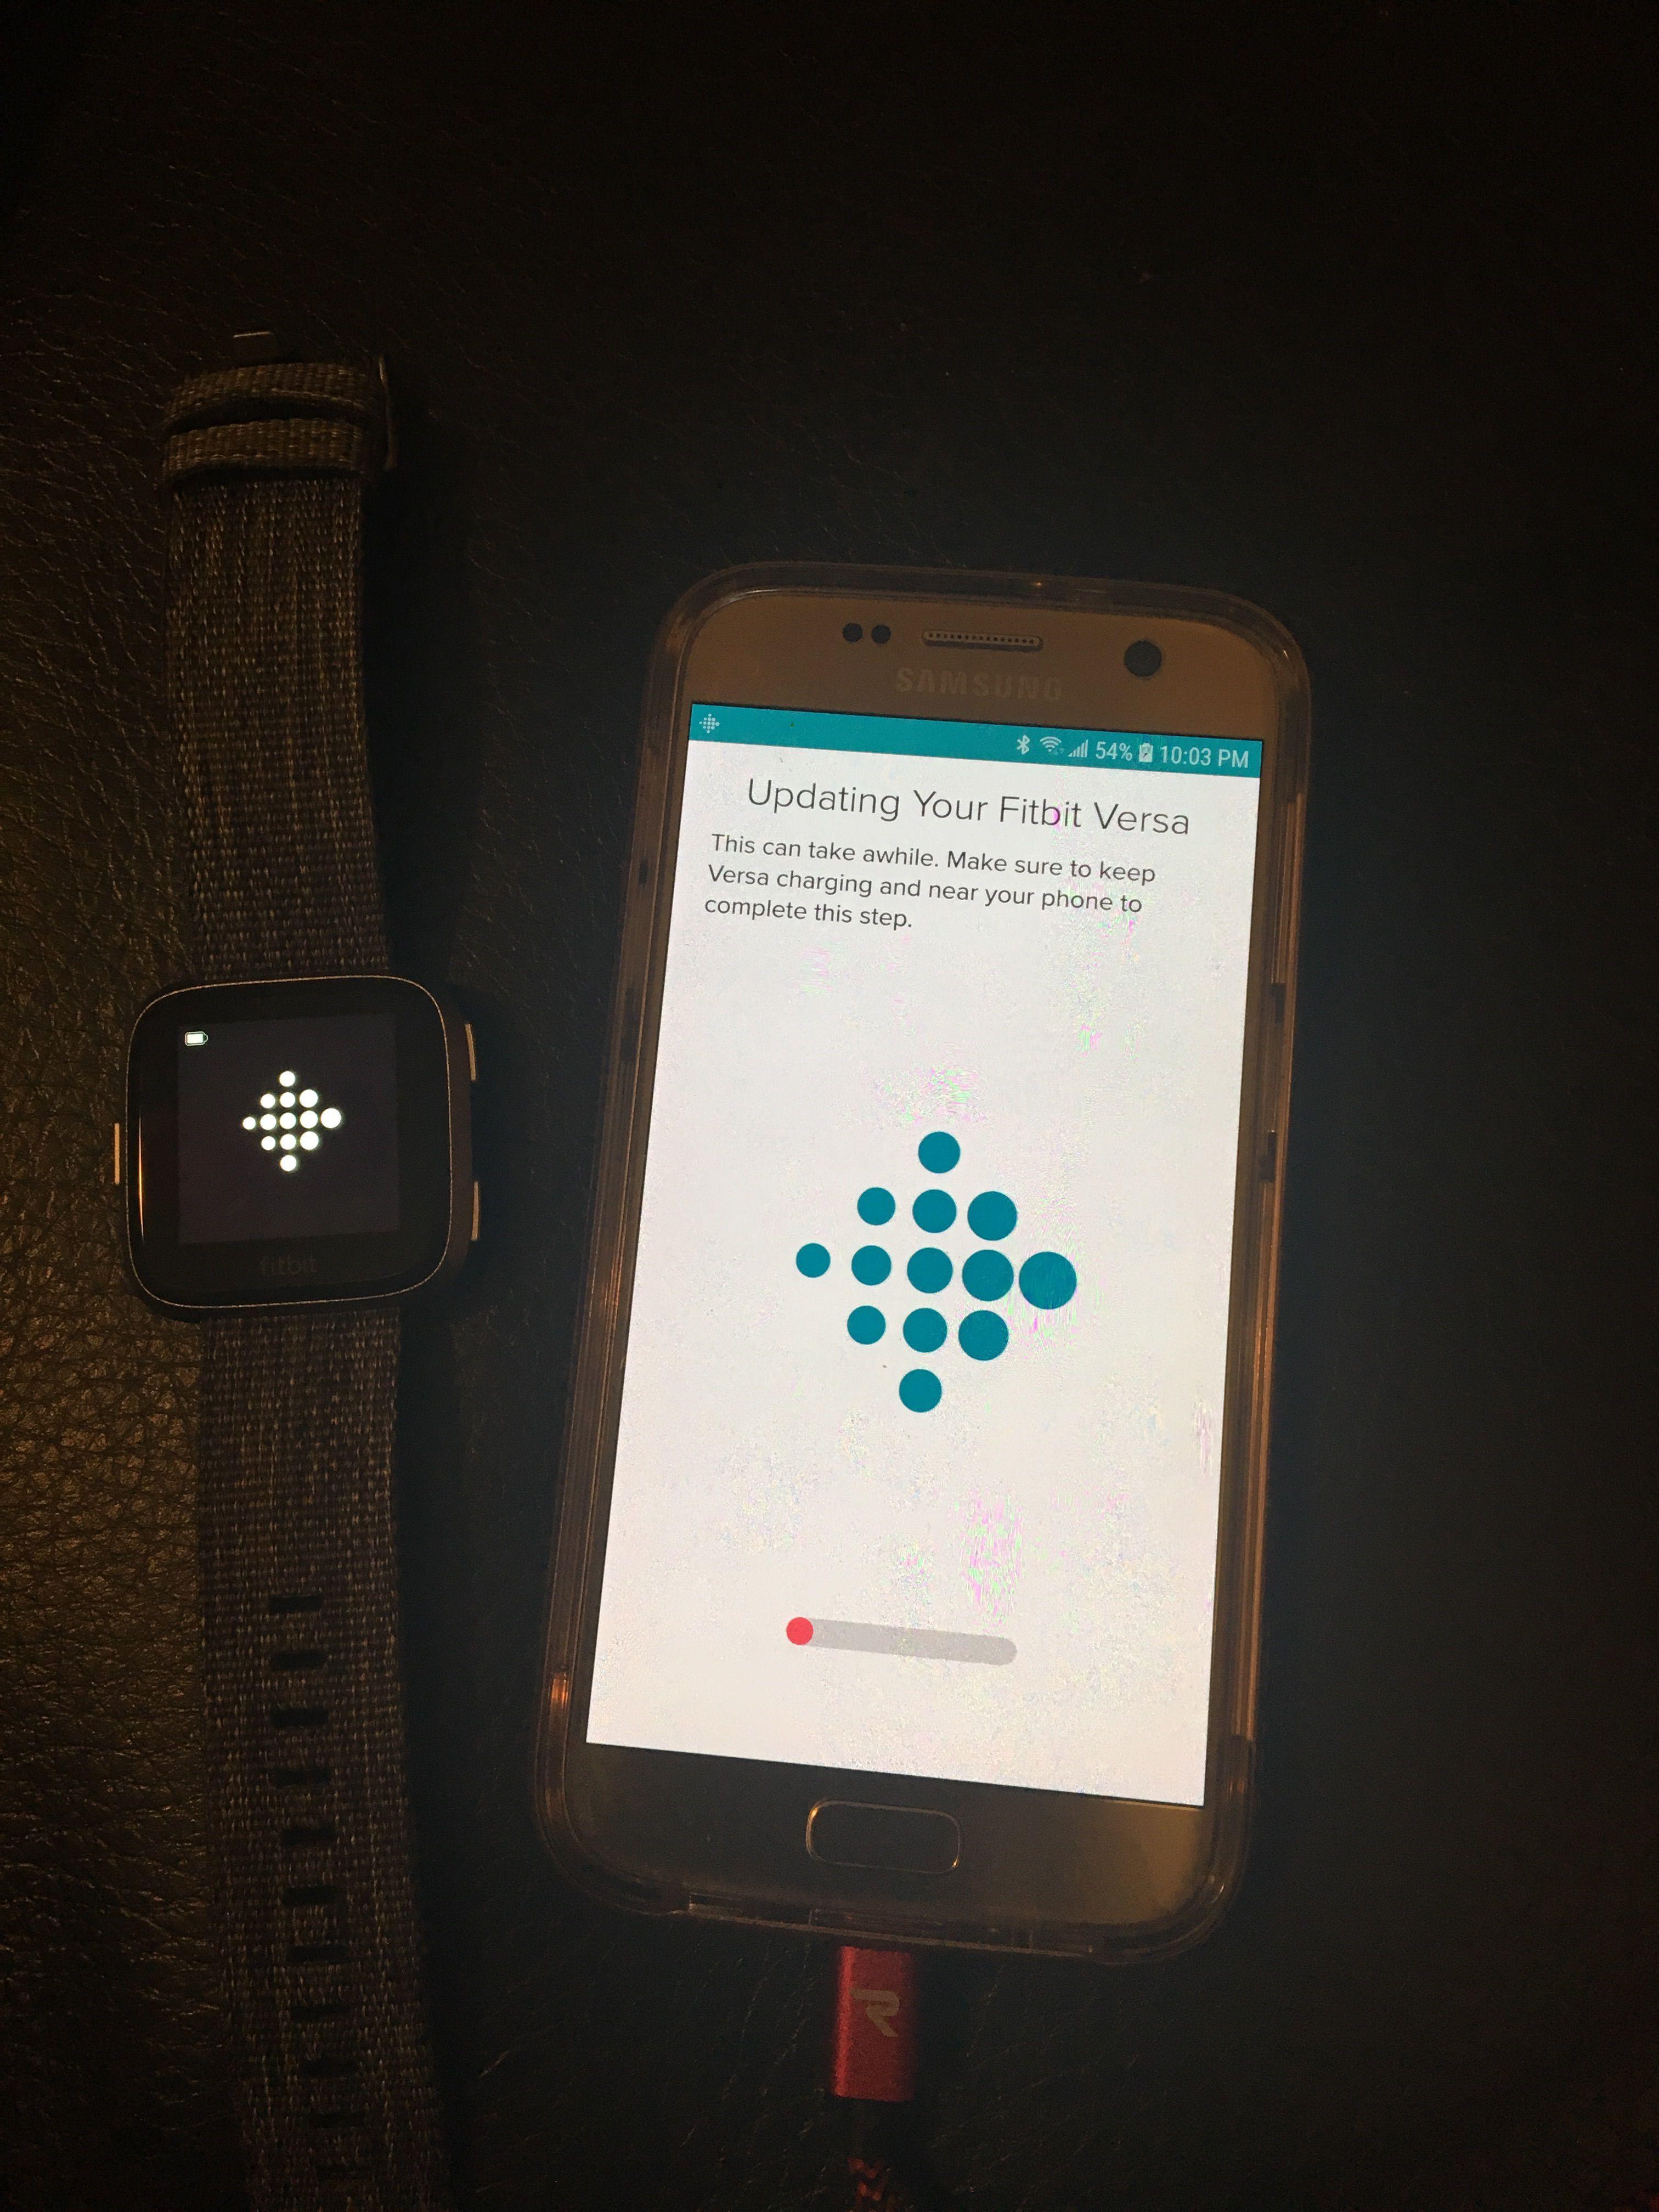 fitbit alta hr won't update firmware